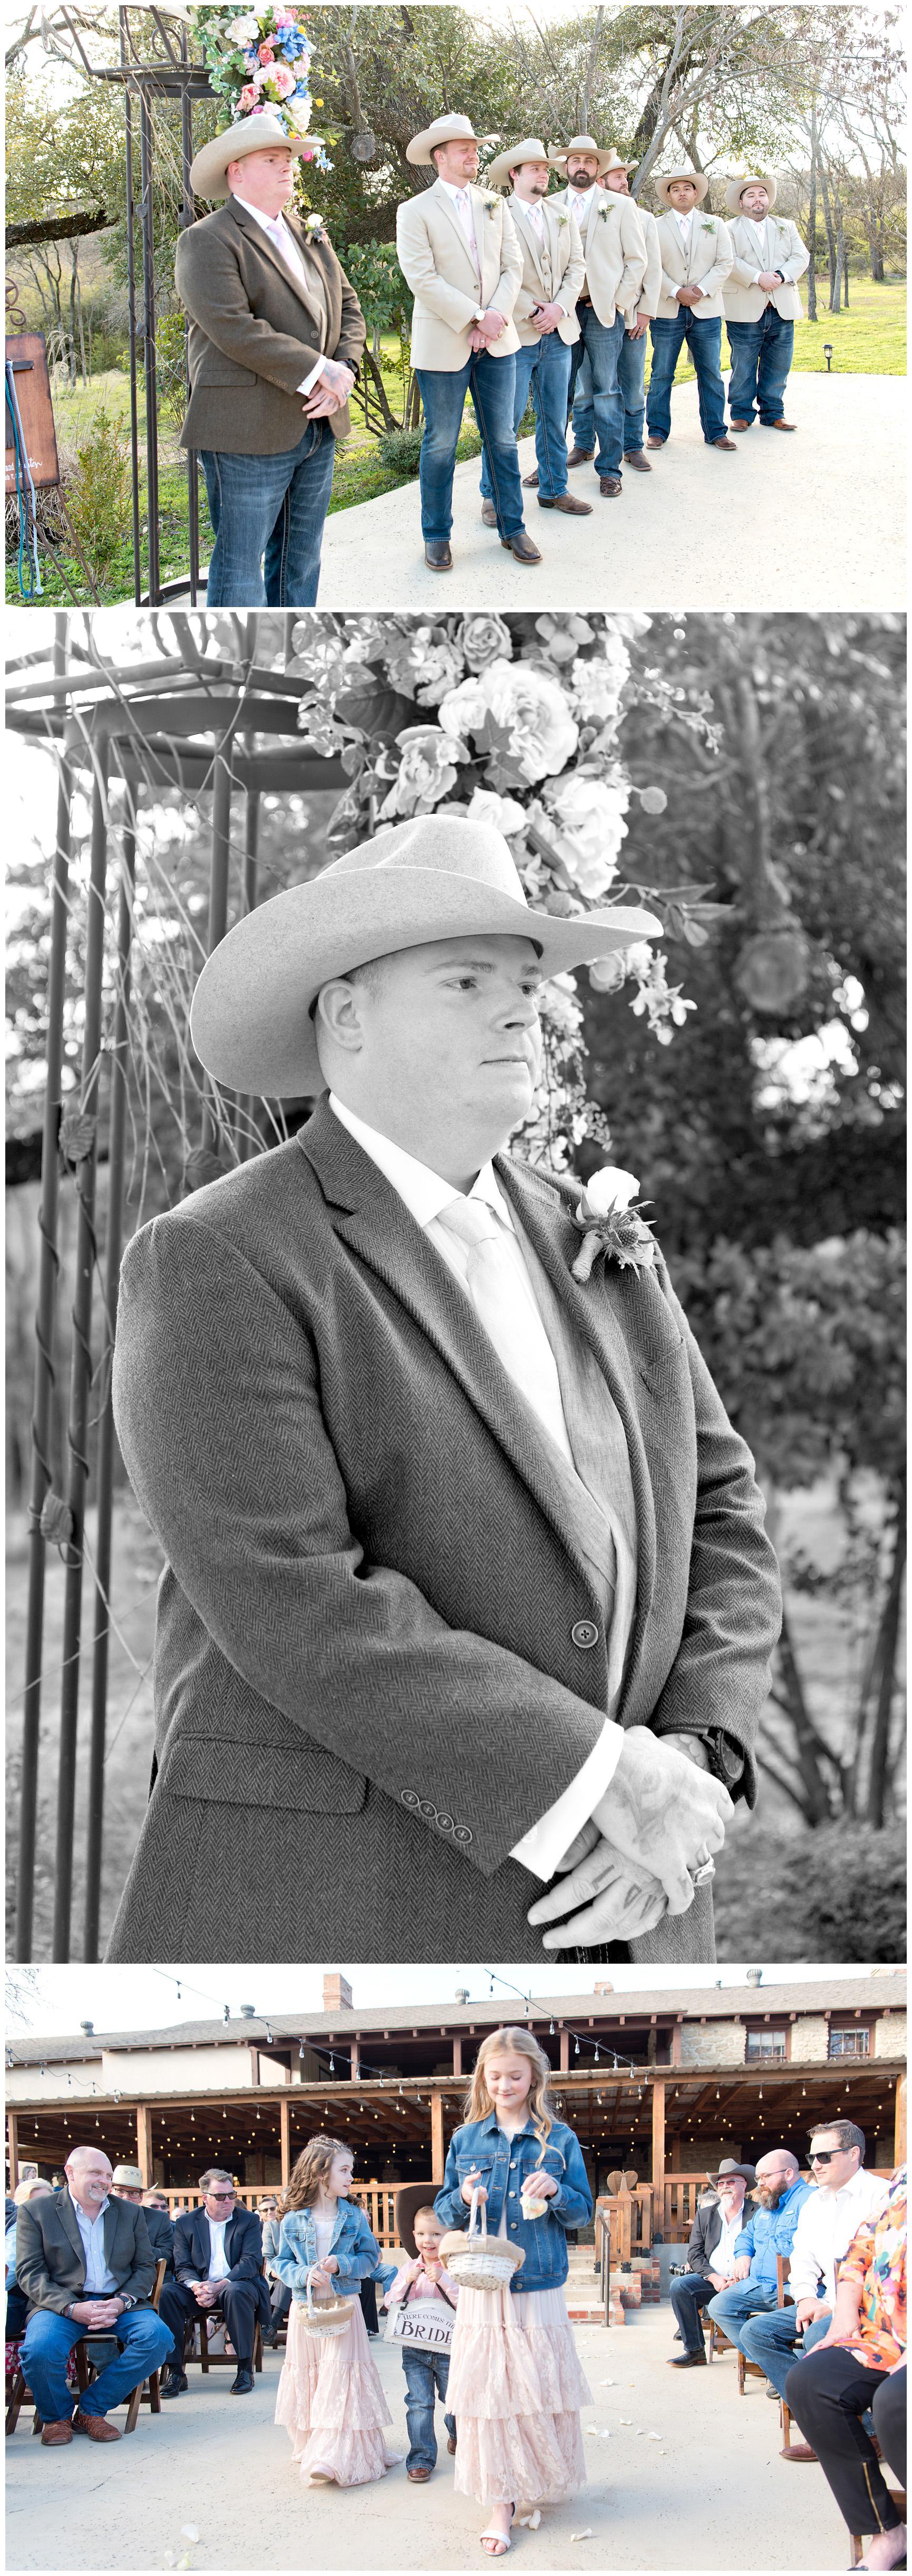 Outdoor Spring Wedding at the Hidden Gardens Venue Fort Worth Texas